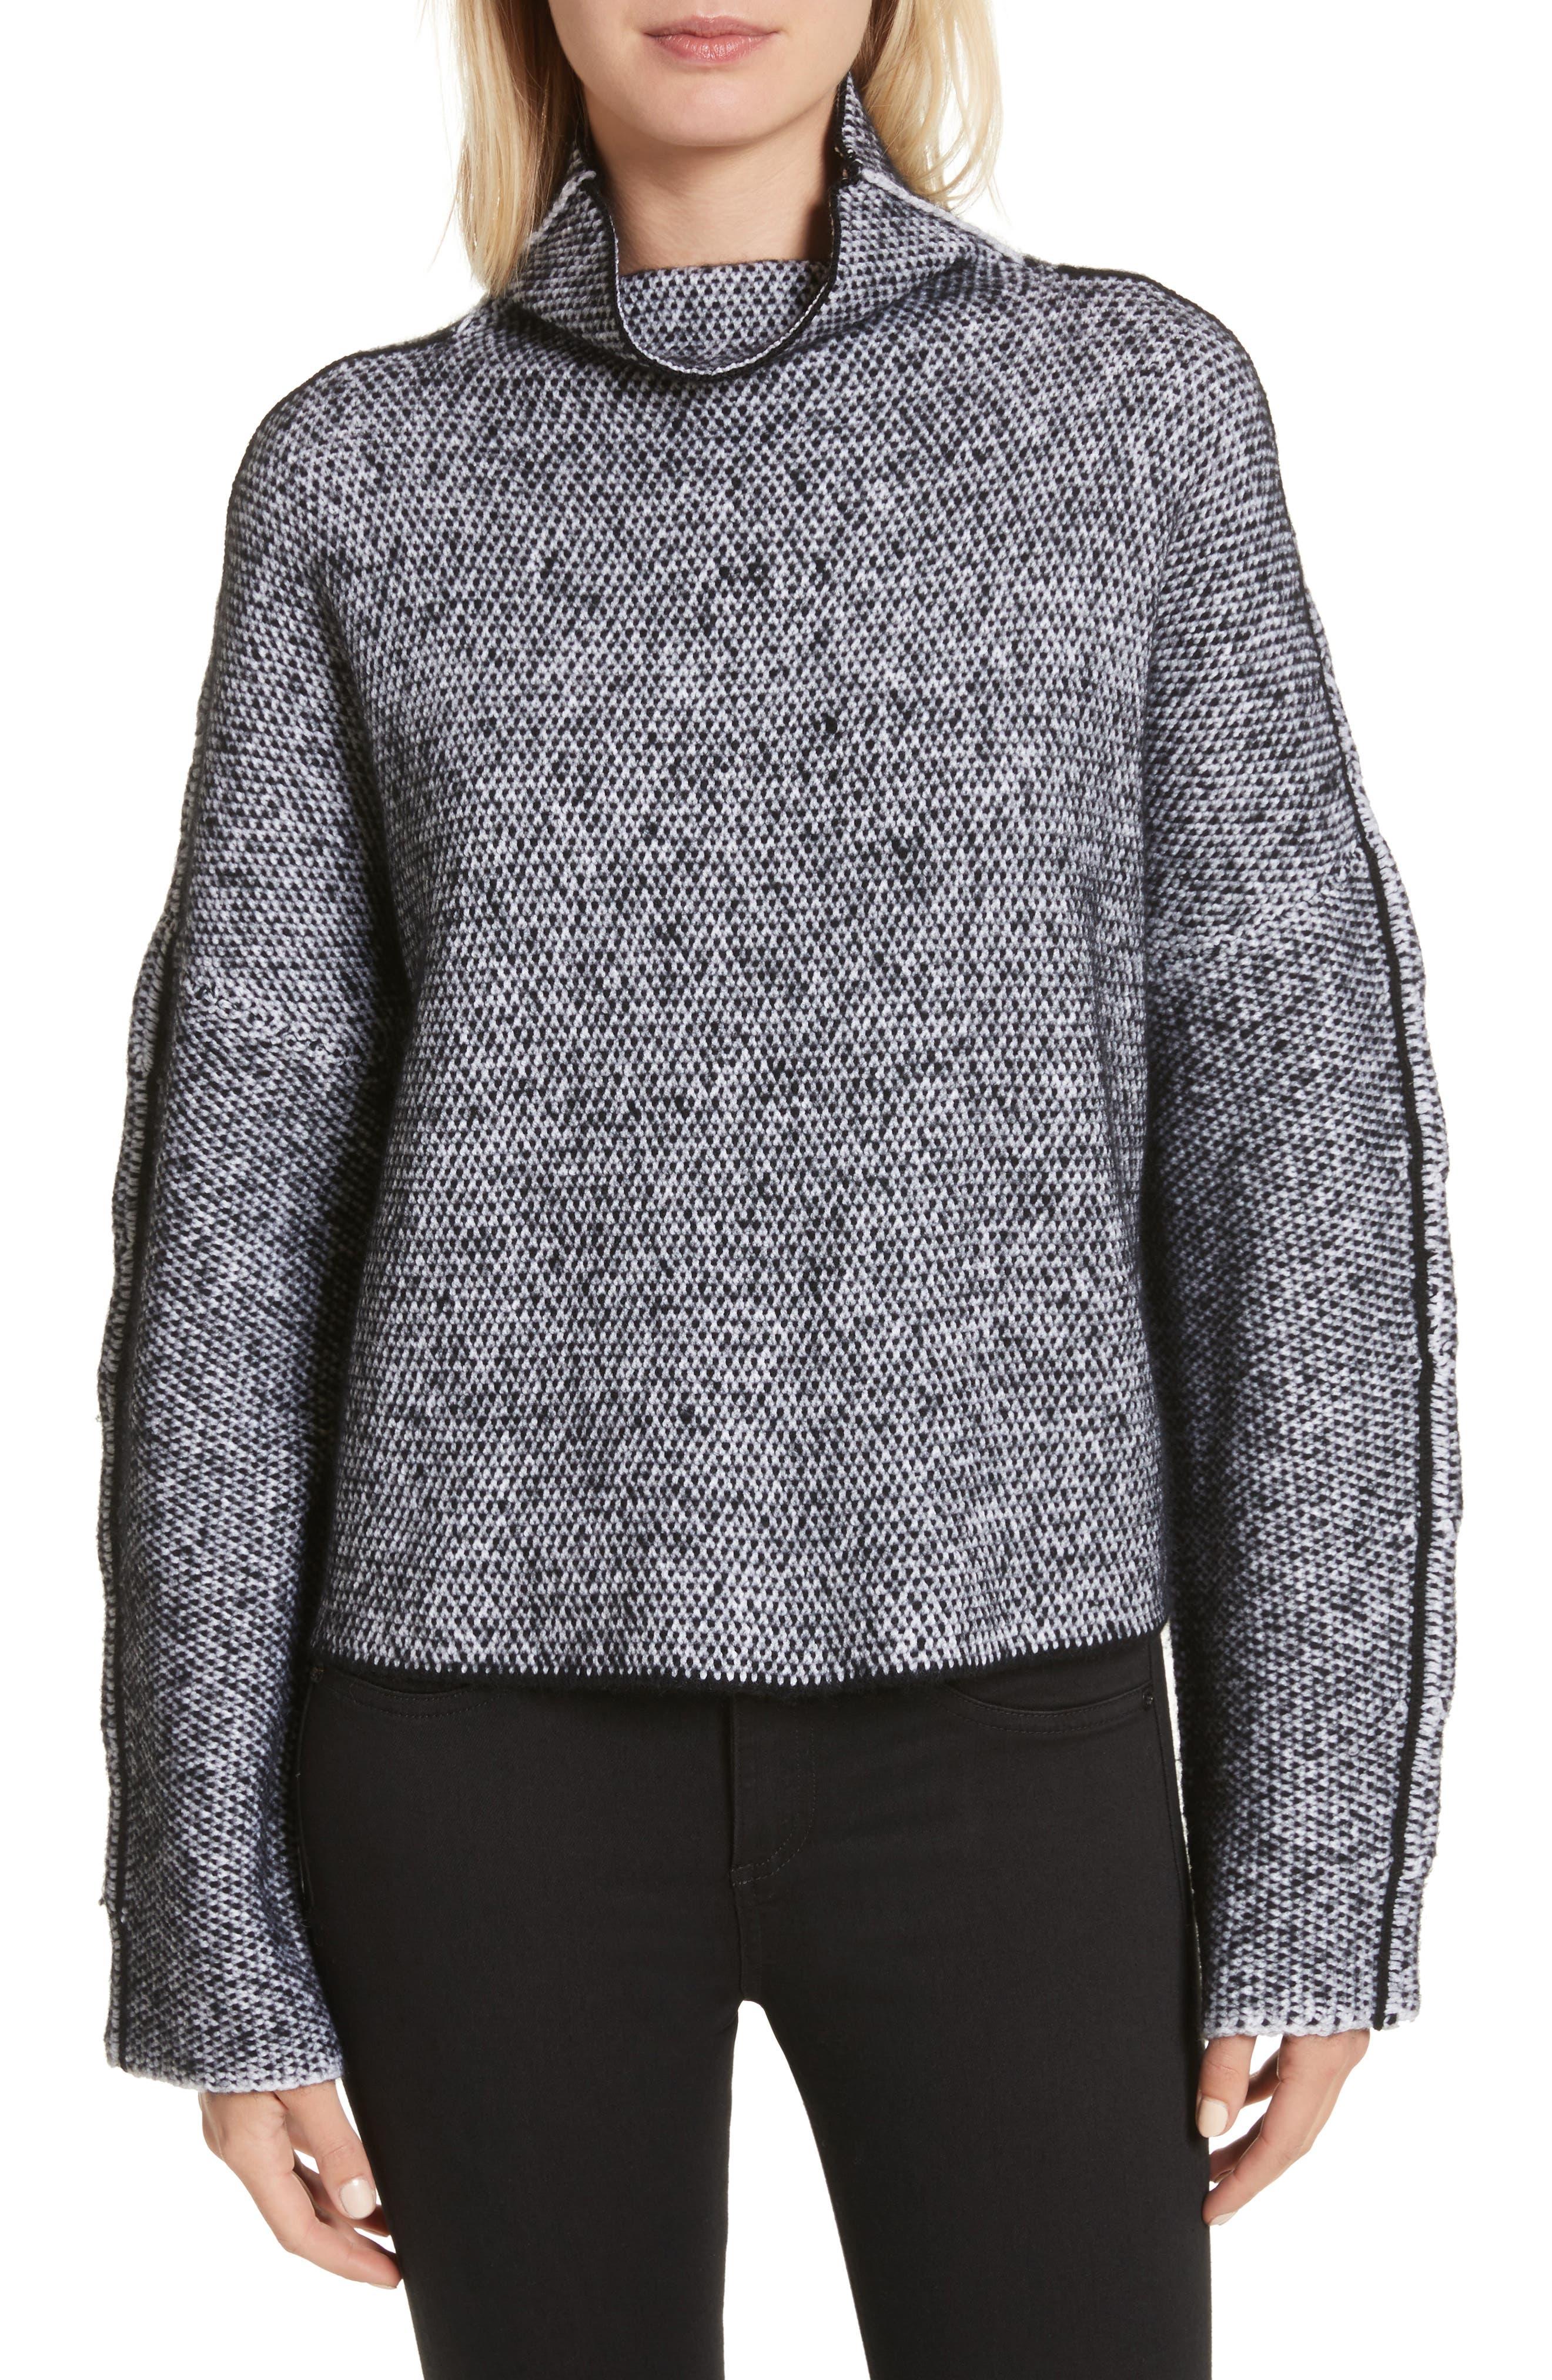 Robin Merino Wool Blend Sweater,                         Main,                         color, Black/White